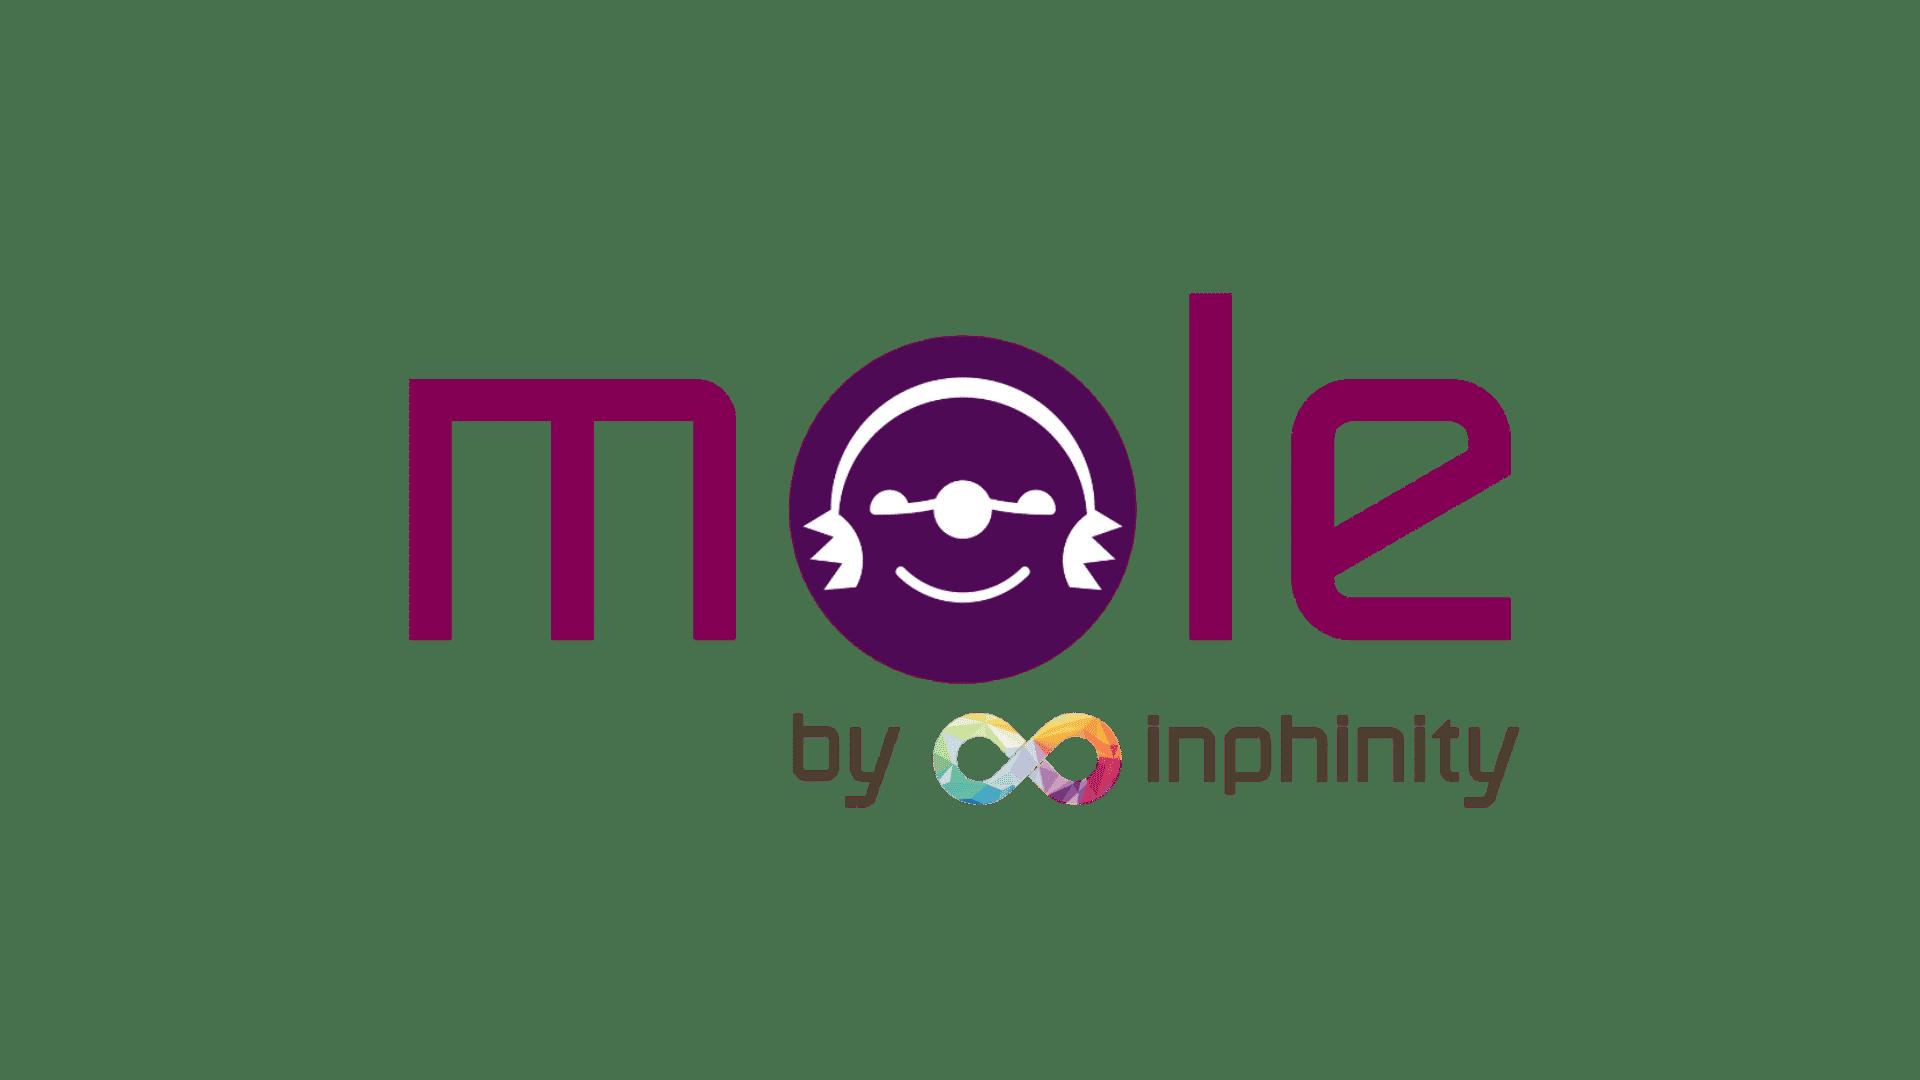 Inphinity Mole